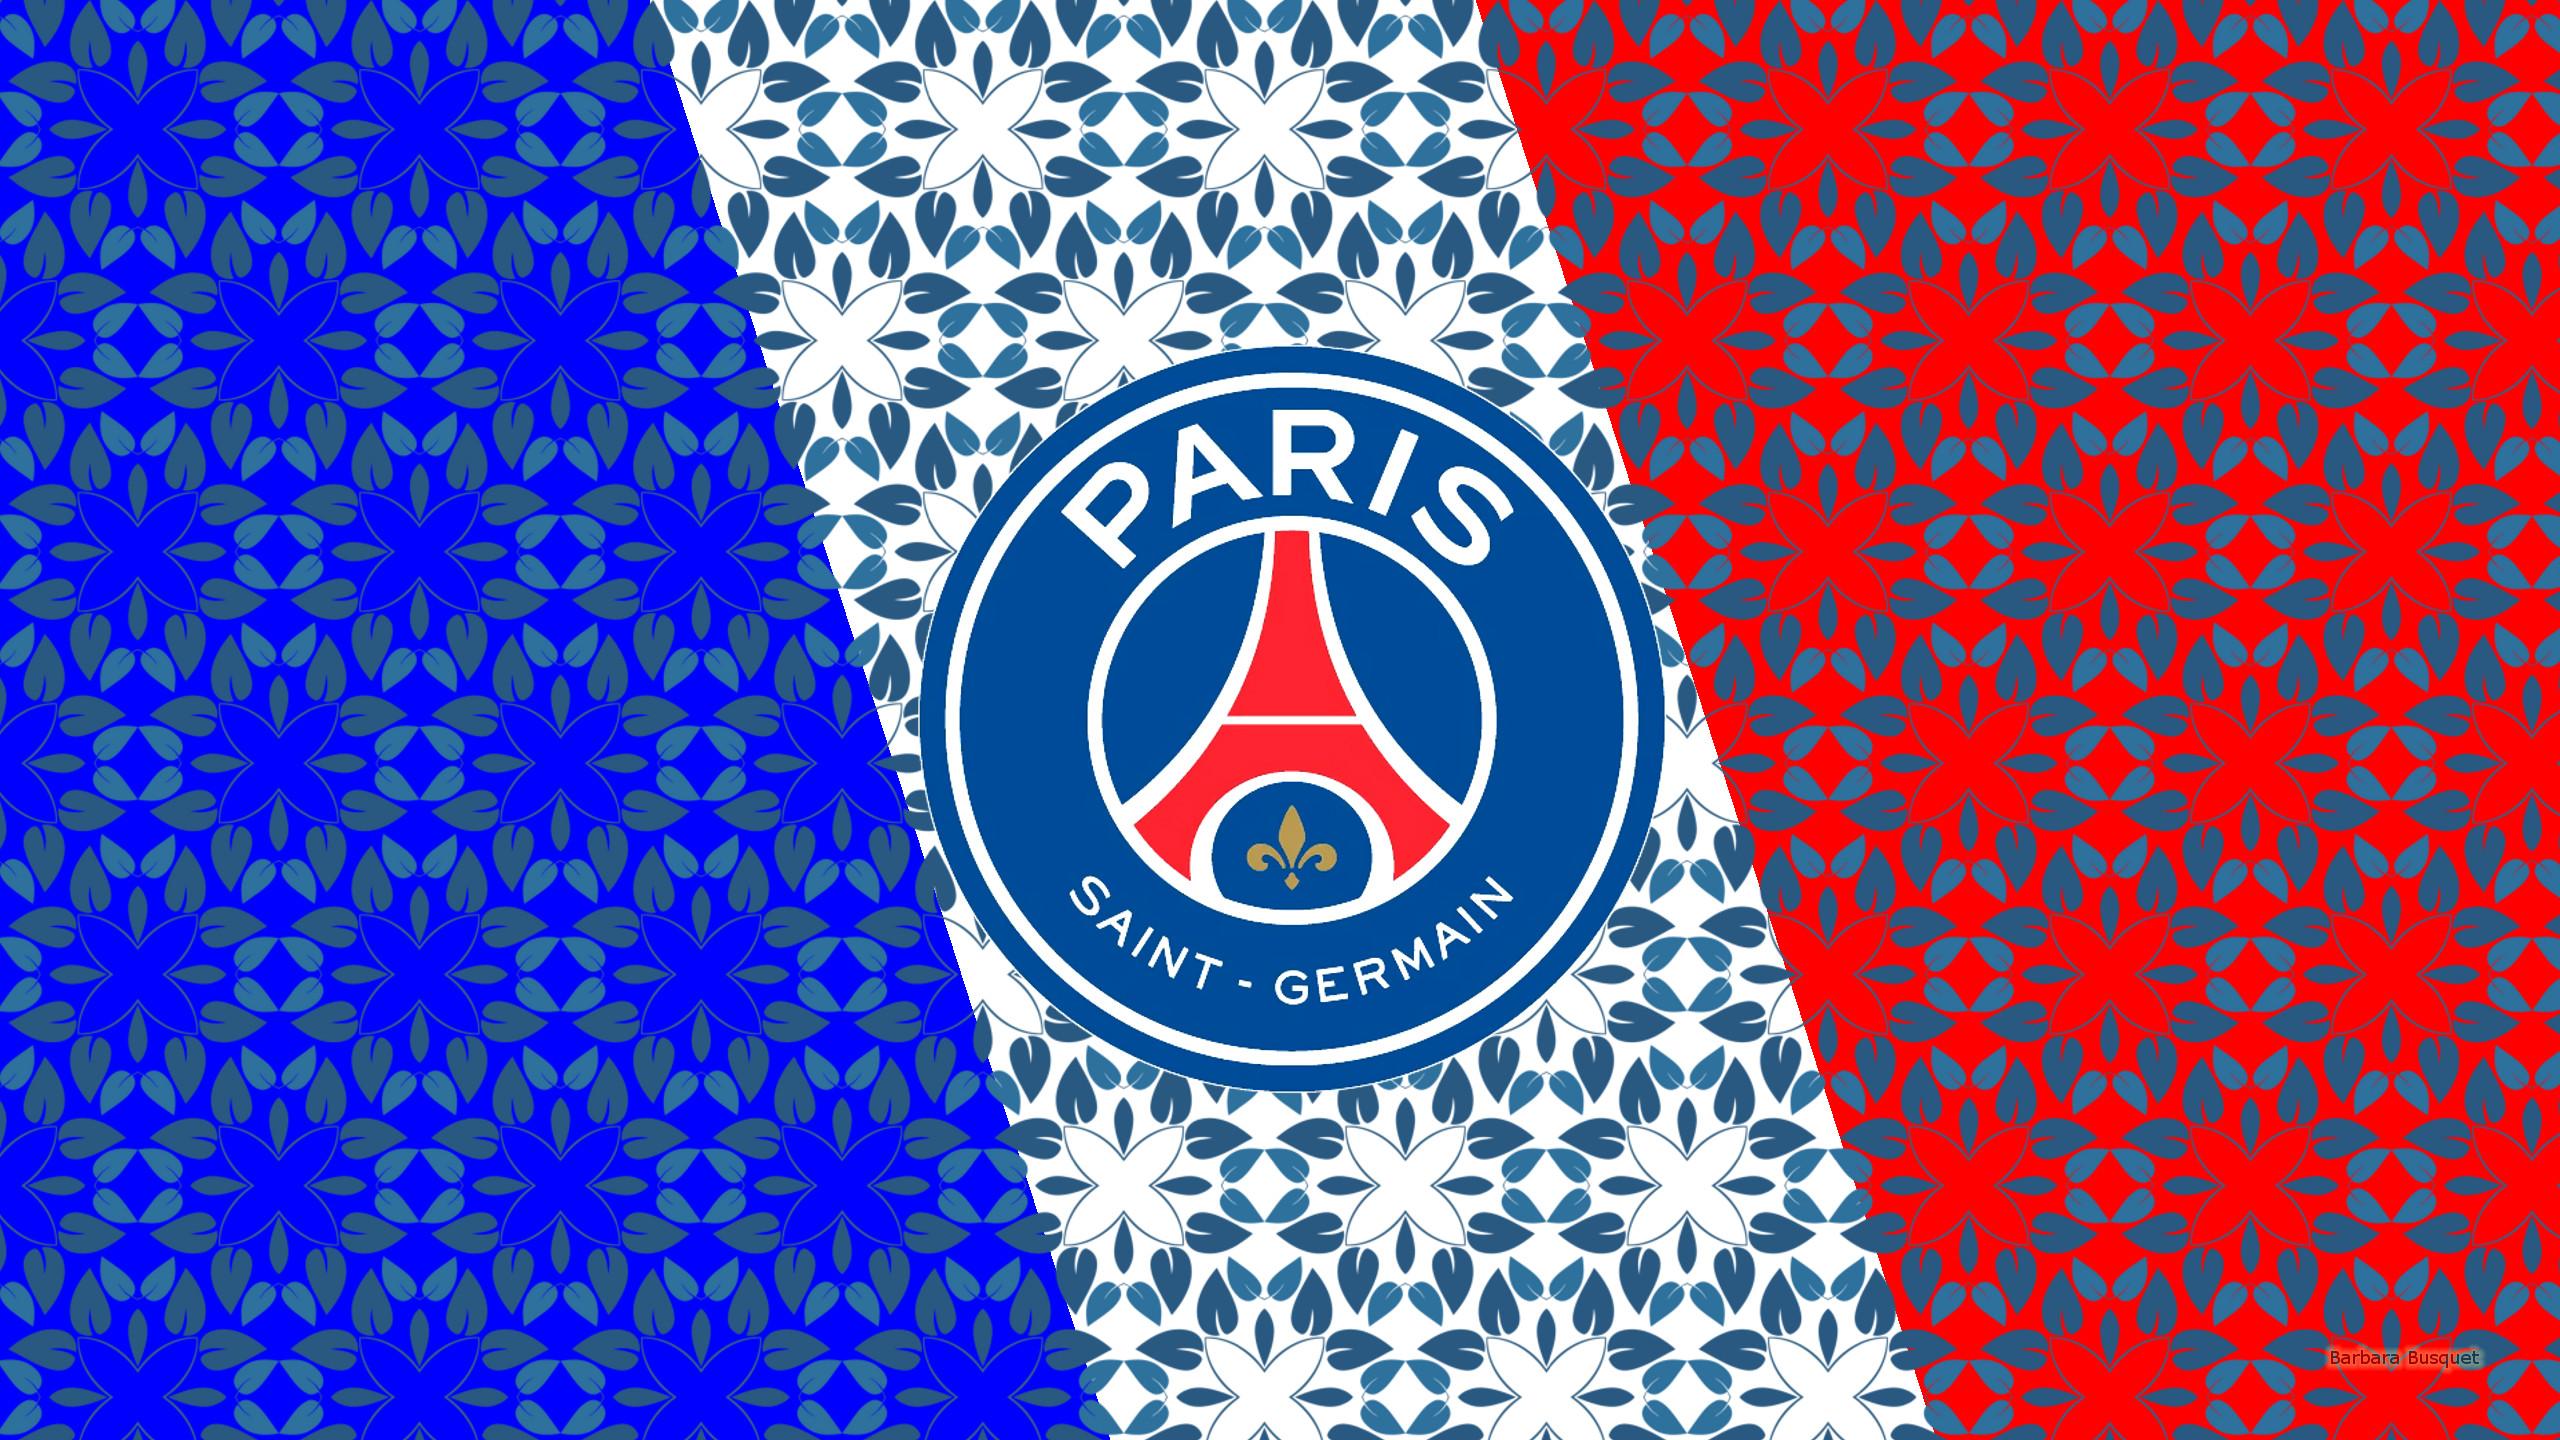 French Flag PSG Emblem Wallpaper